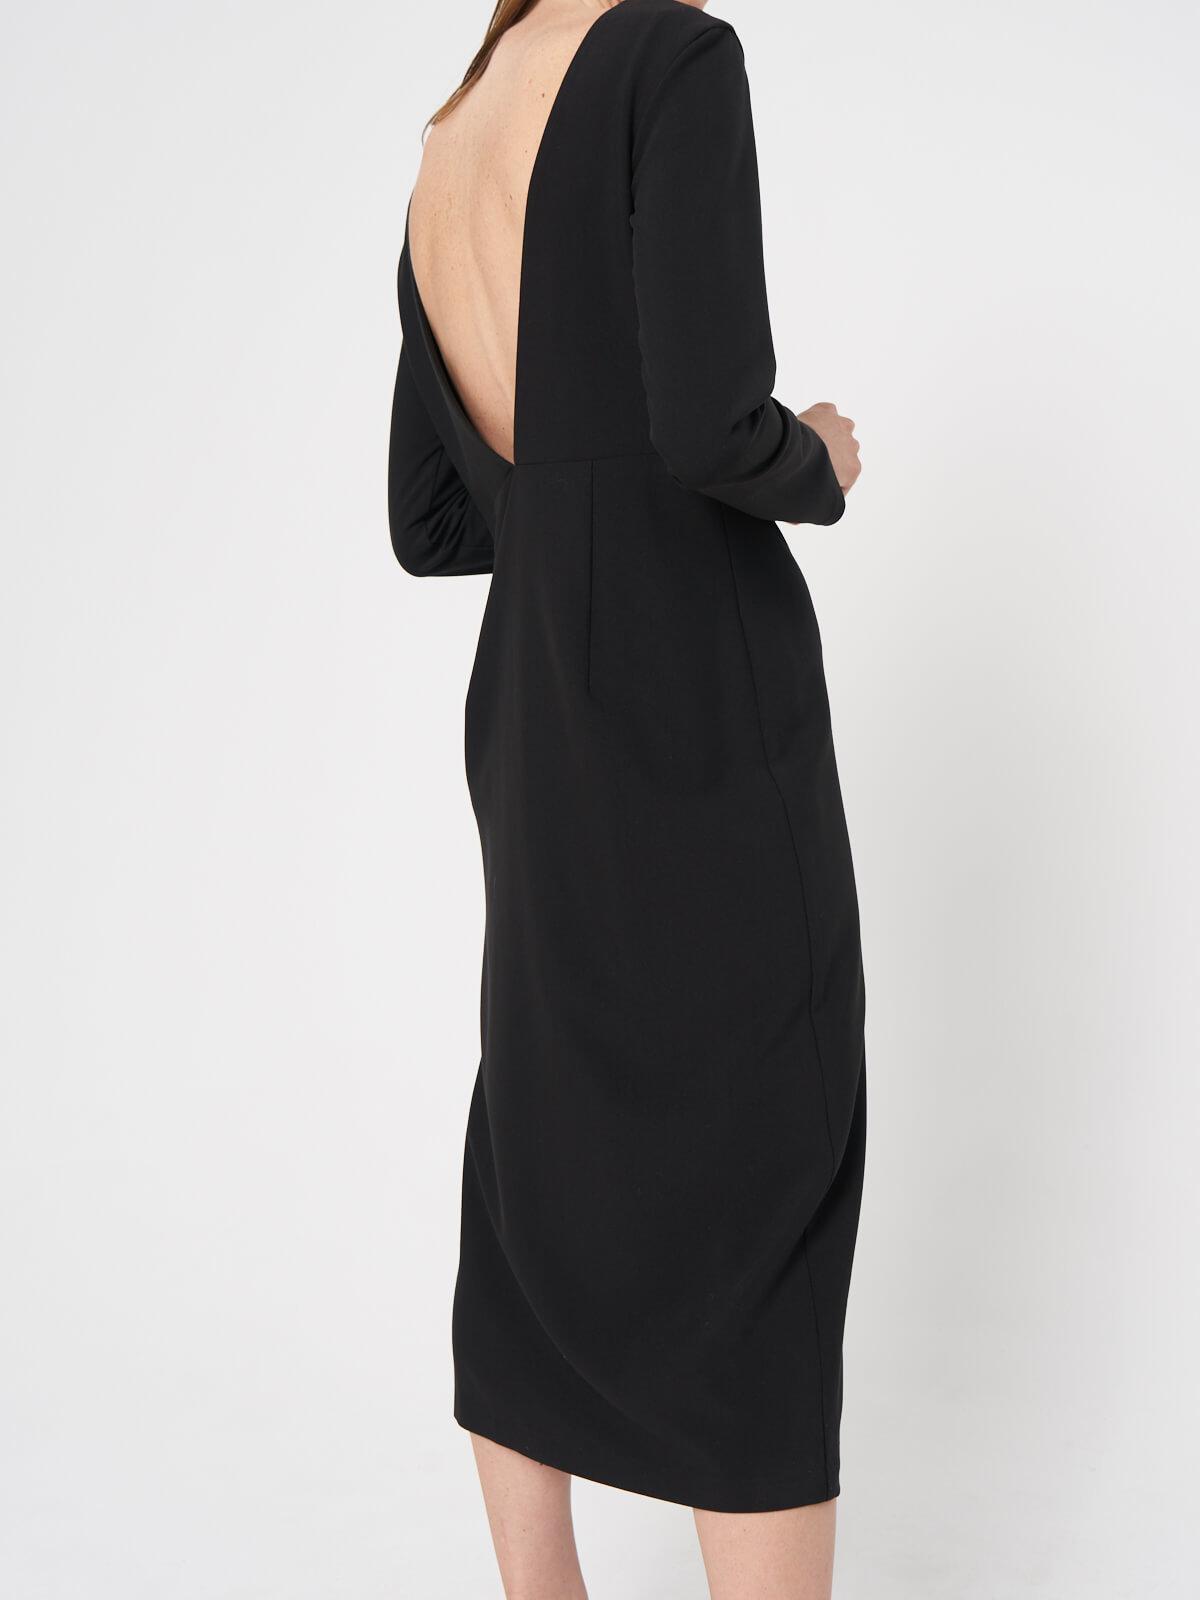 Платье Amelie фото